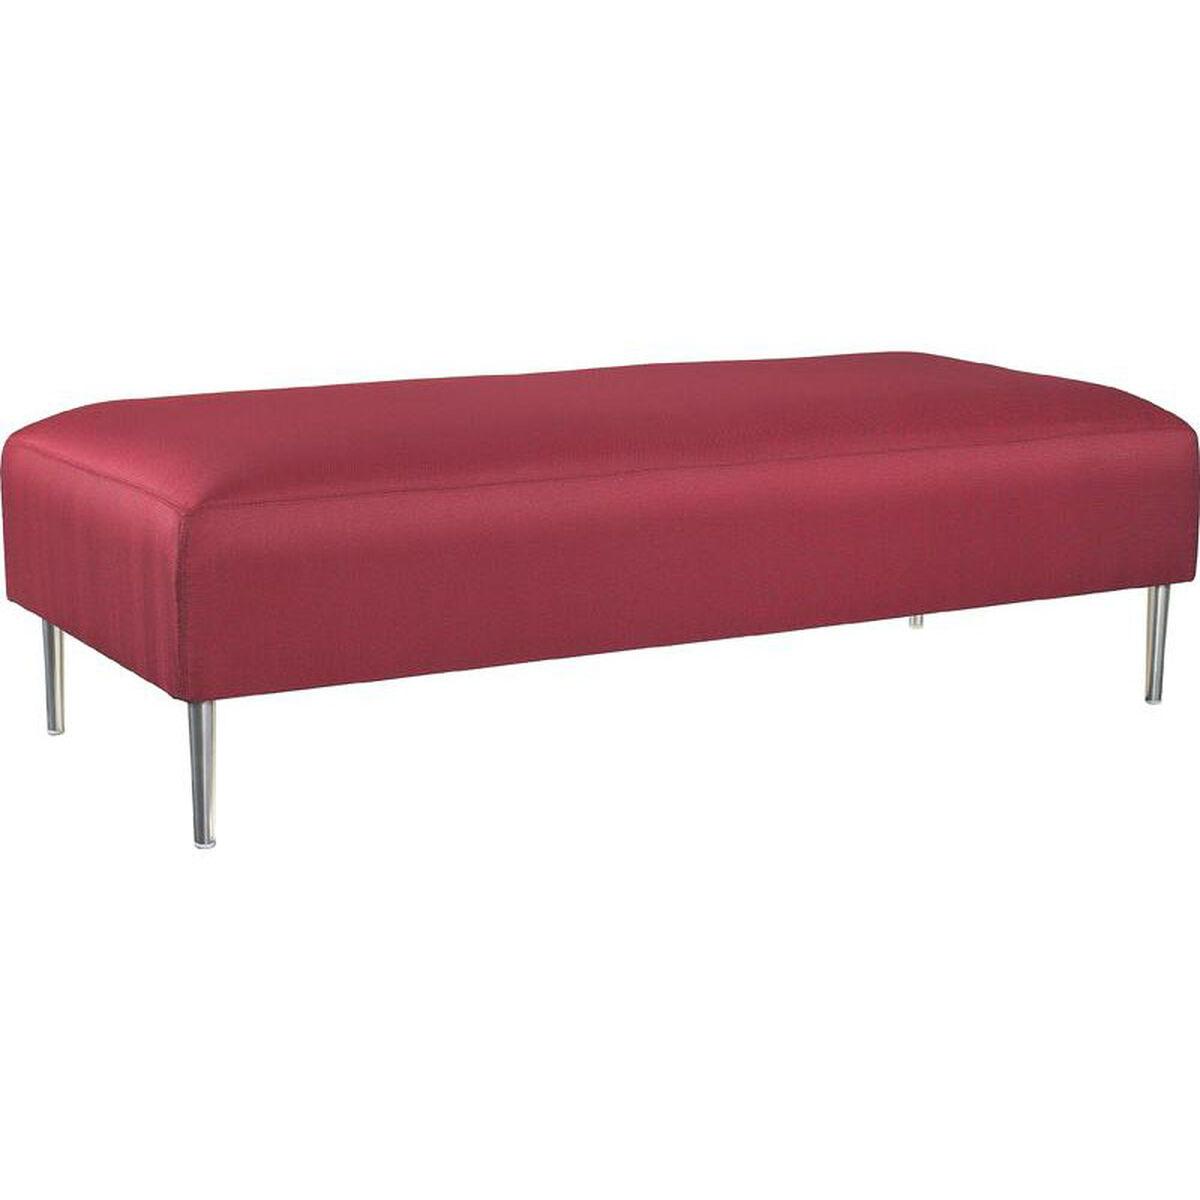 High Point Furniture Industries 5833 Hpf 5833